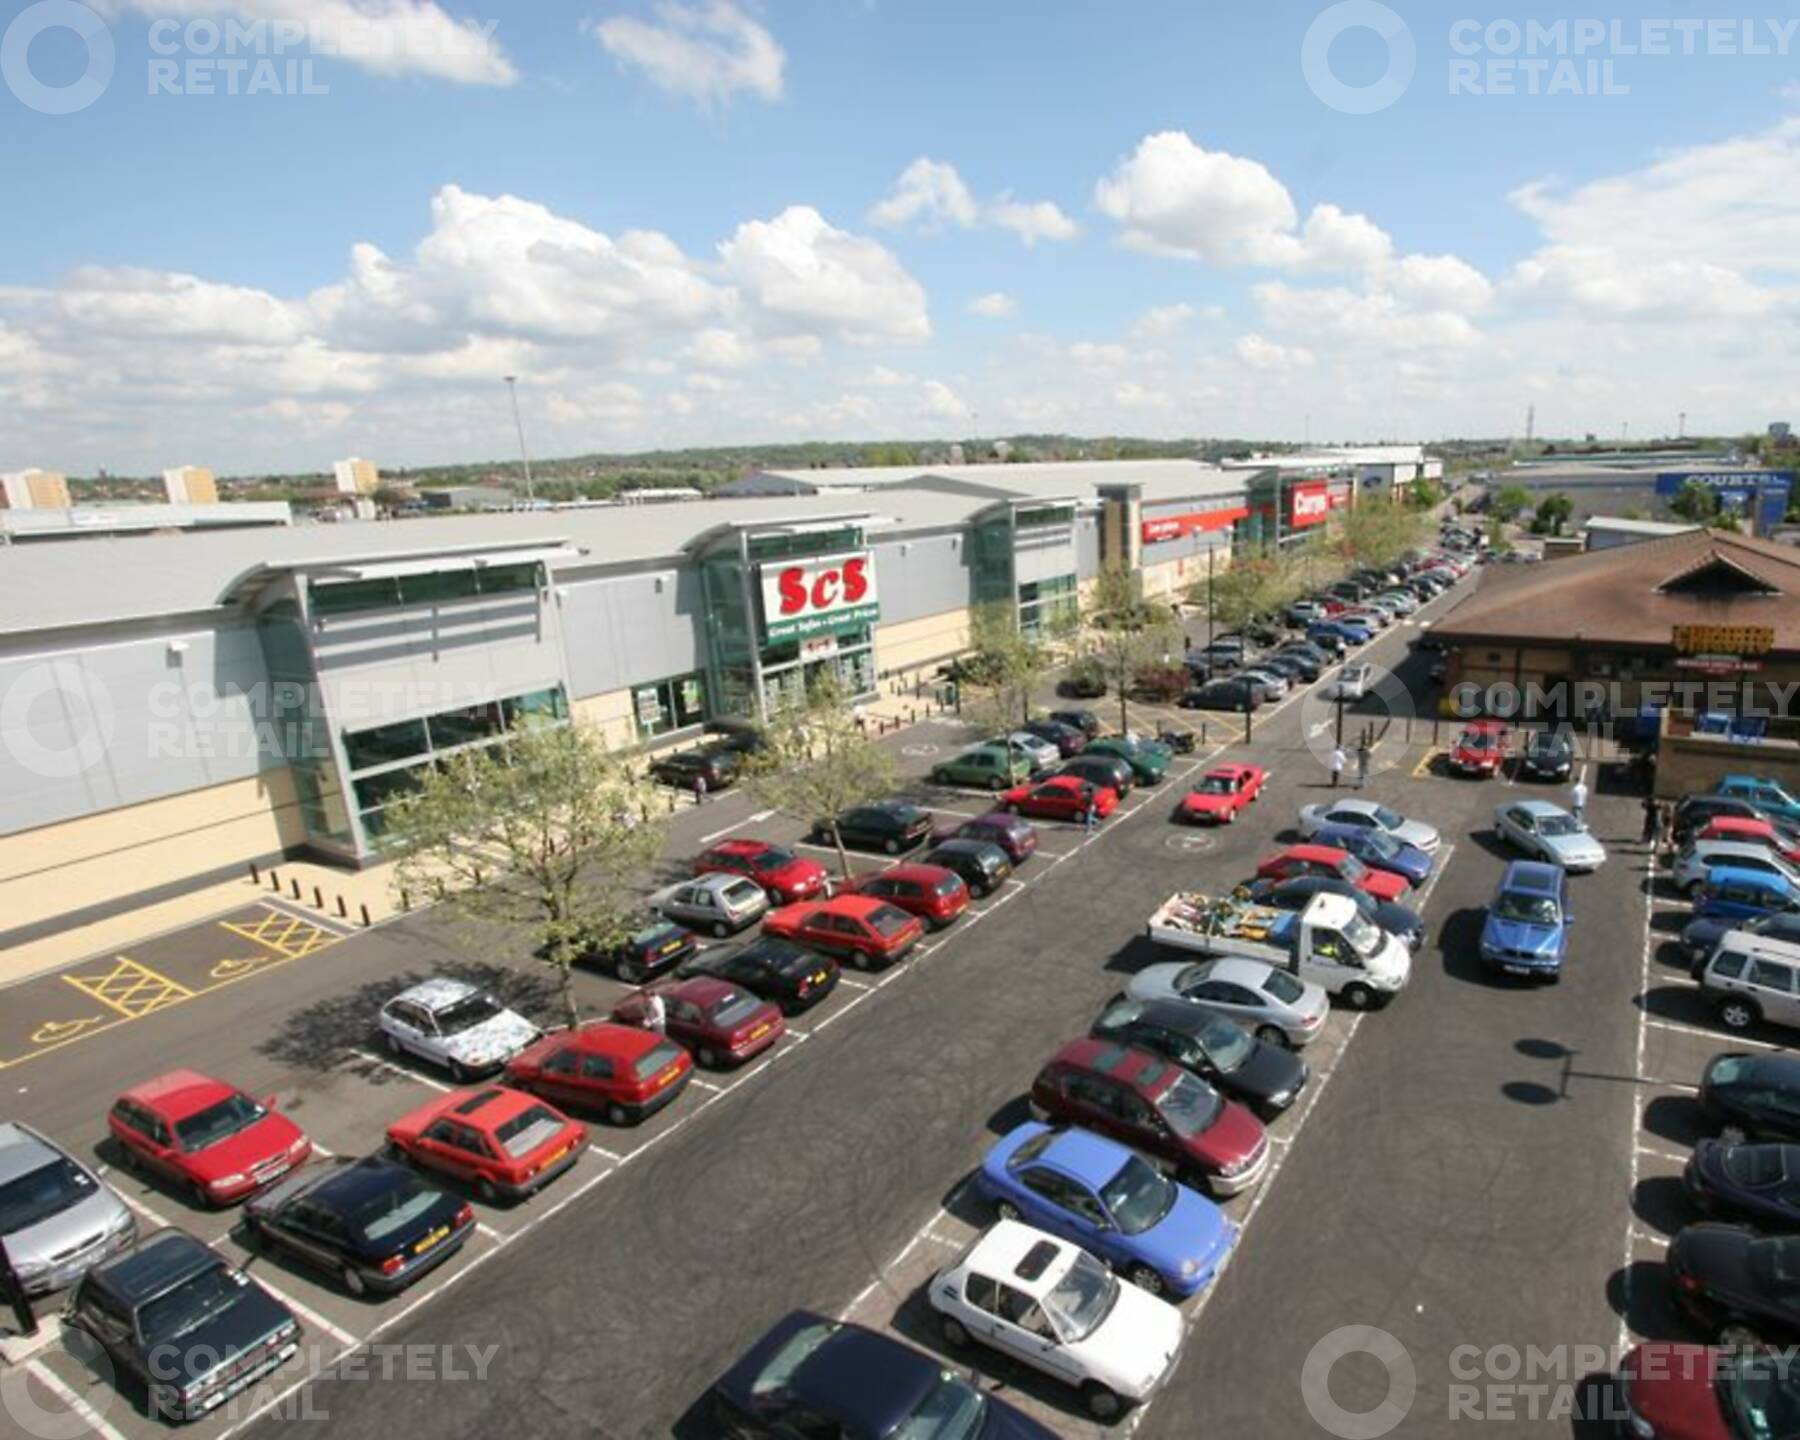 Staples Corner Retail Park